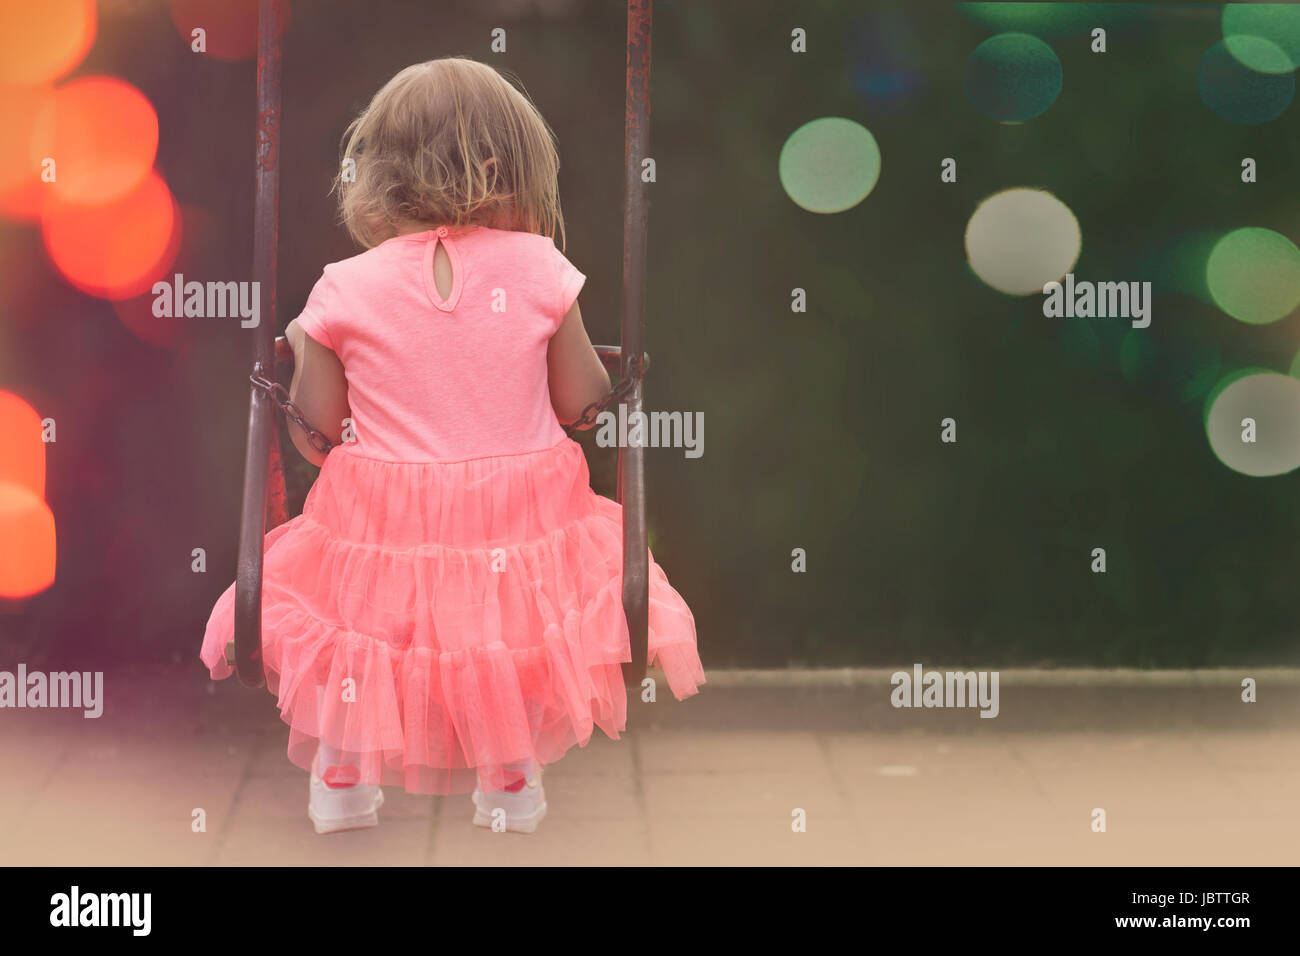 Little girl in beautiful pink dress swinging - Stock Image